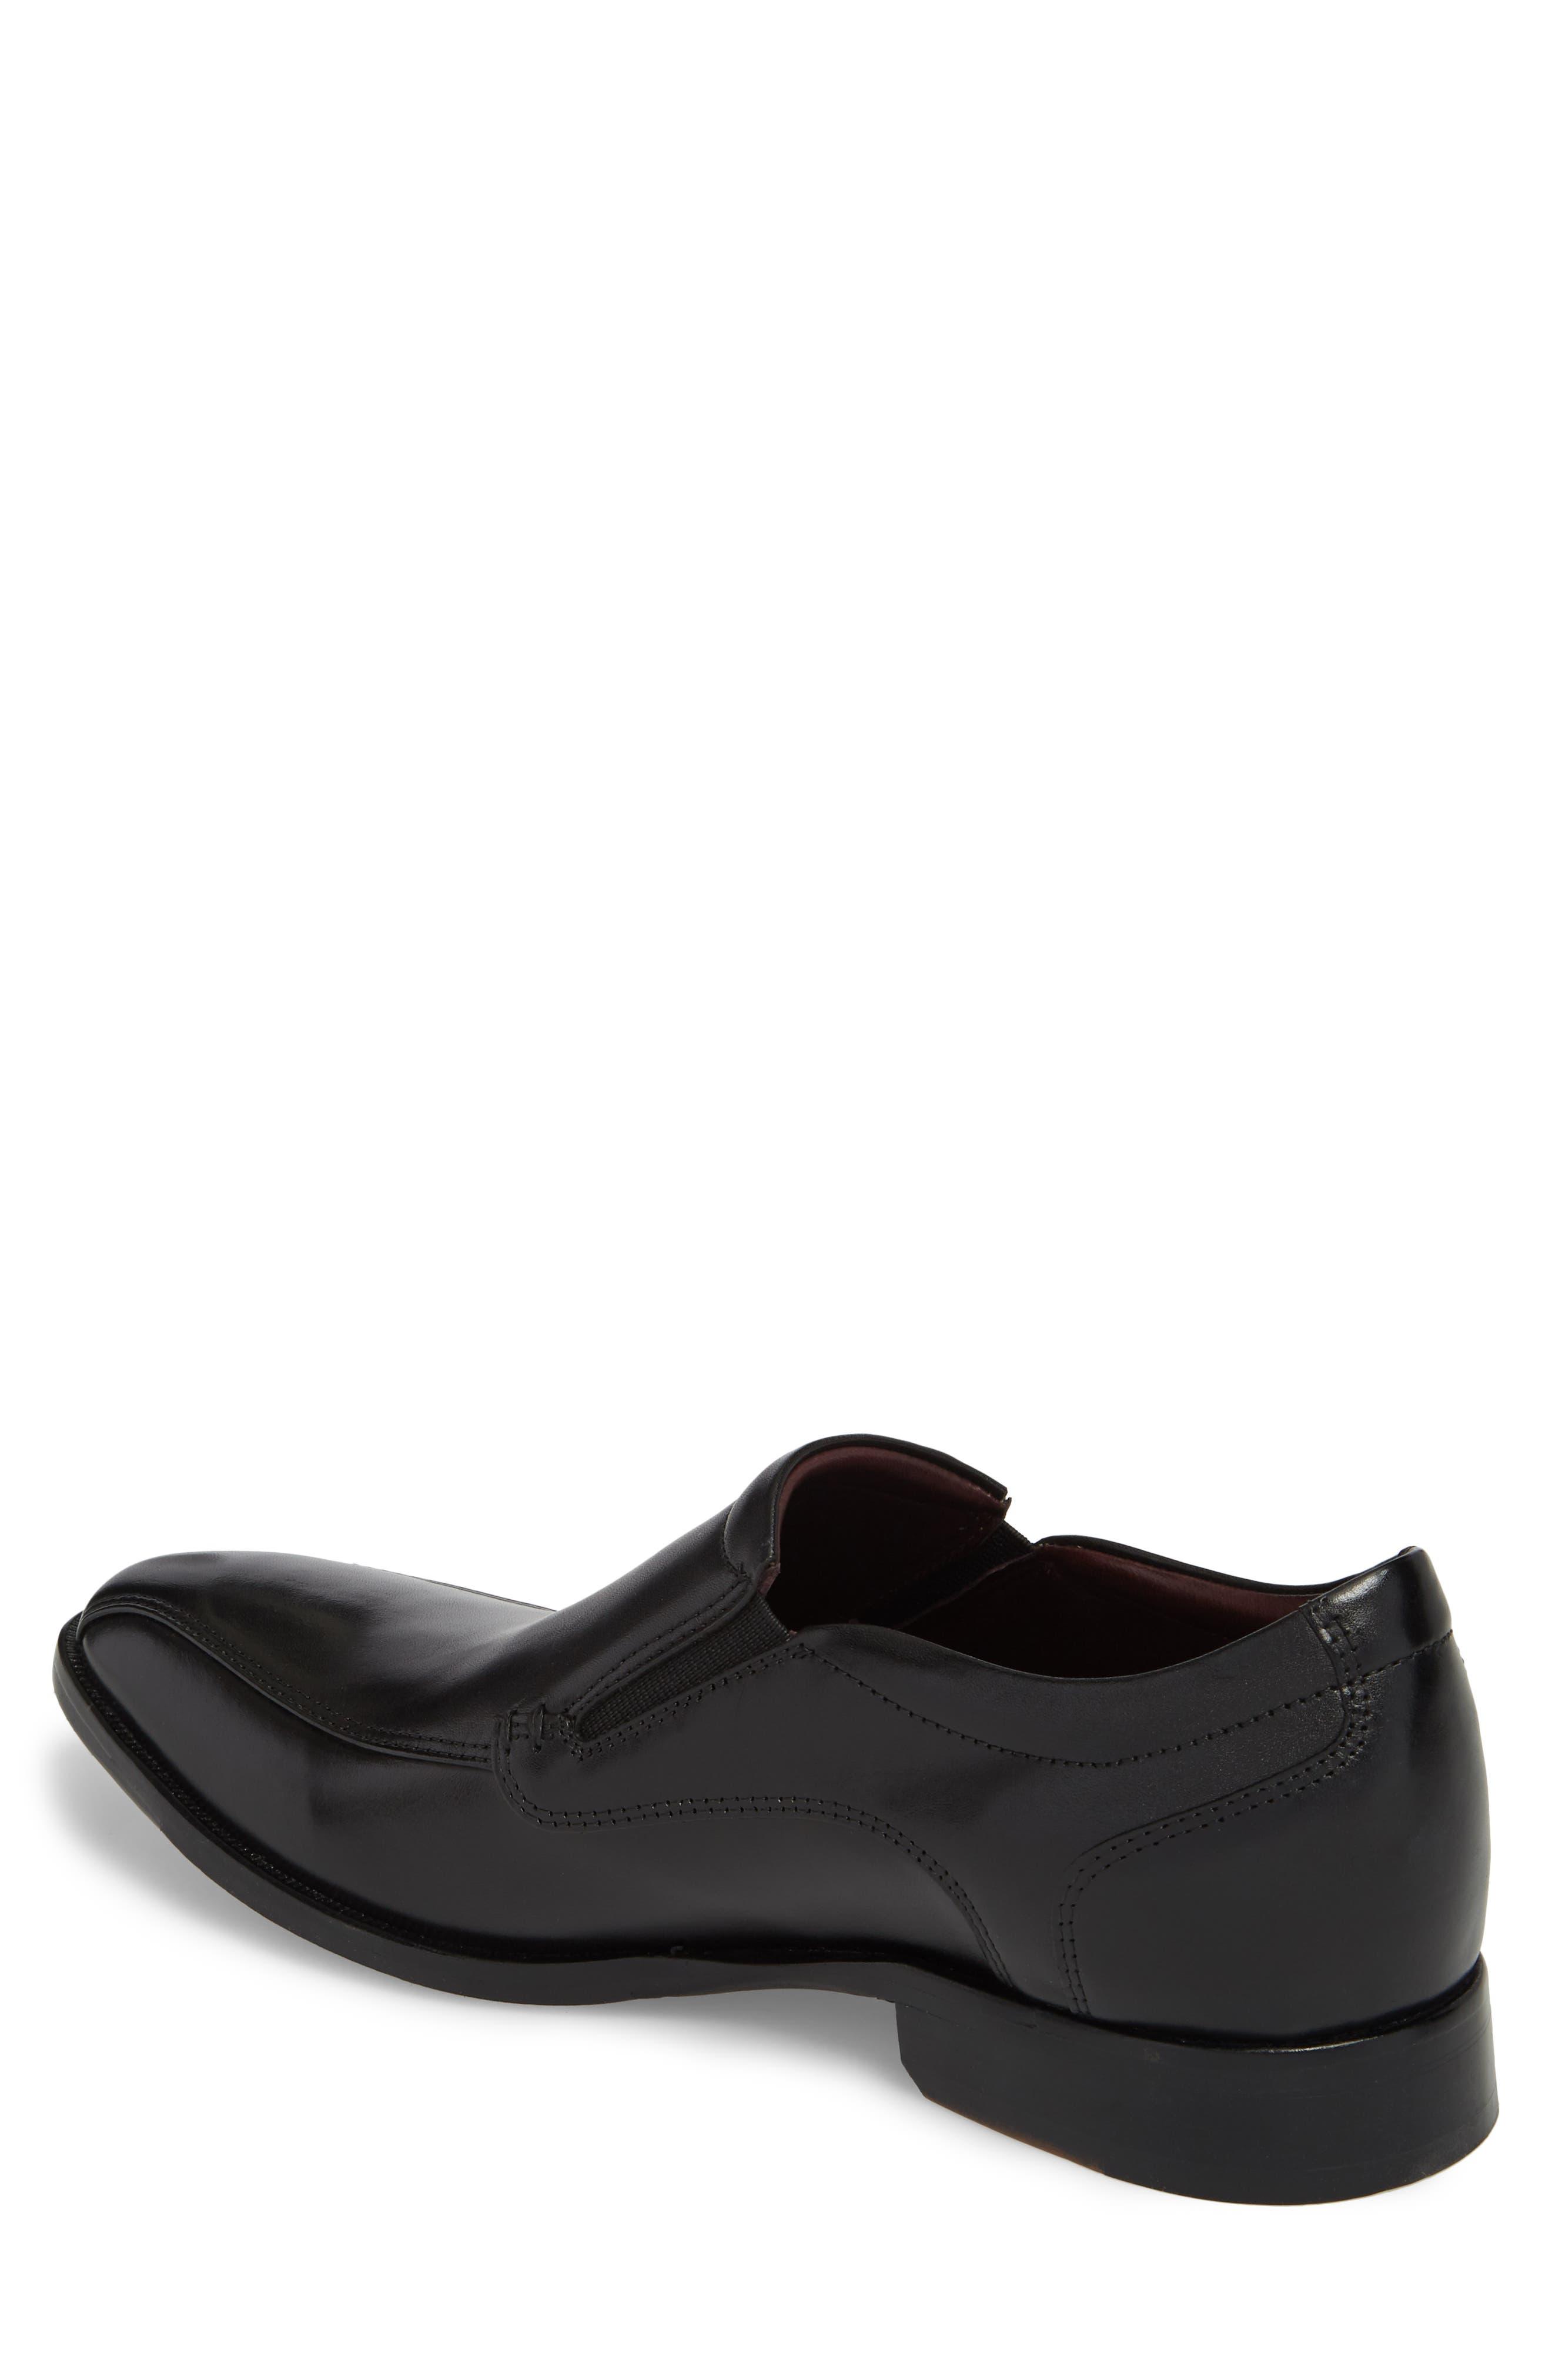 McClain Runoff Bike Toe Slip-On,                             Alternate thumbnail 2, color,                             Black Leather